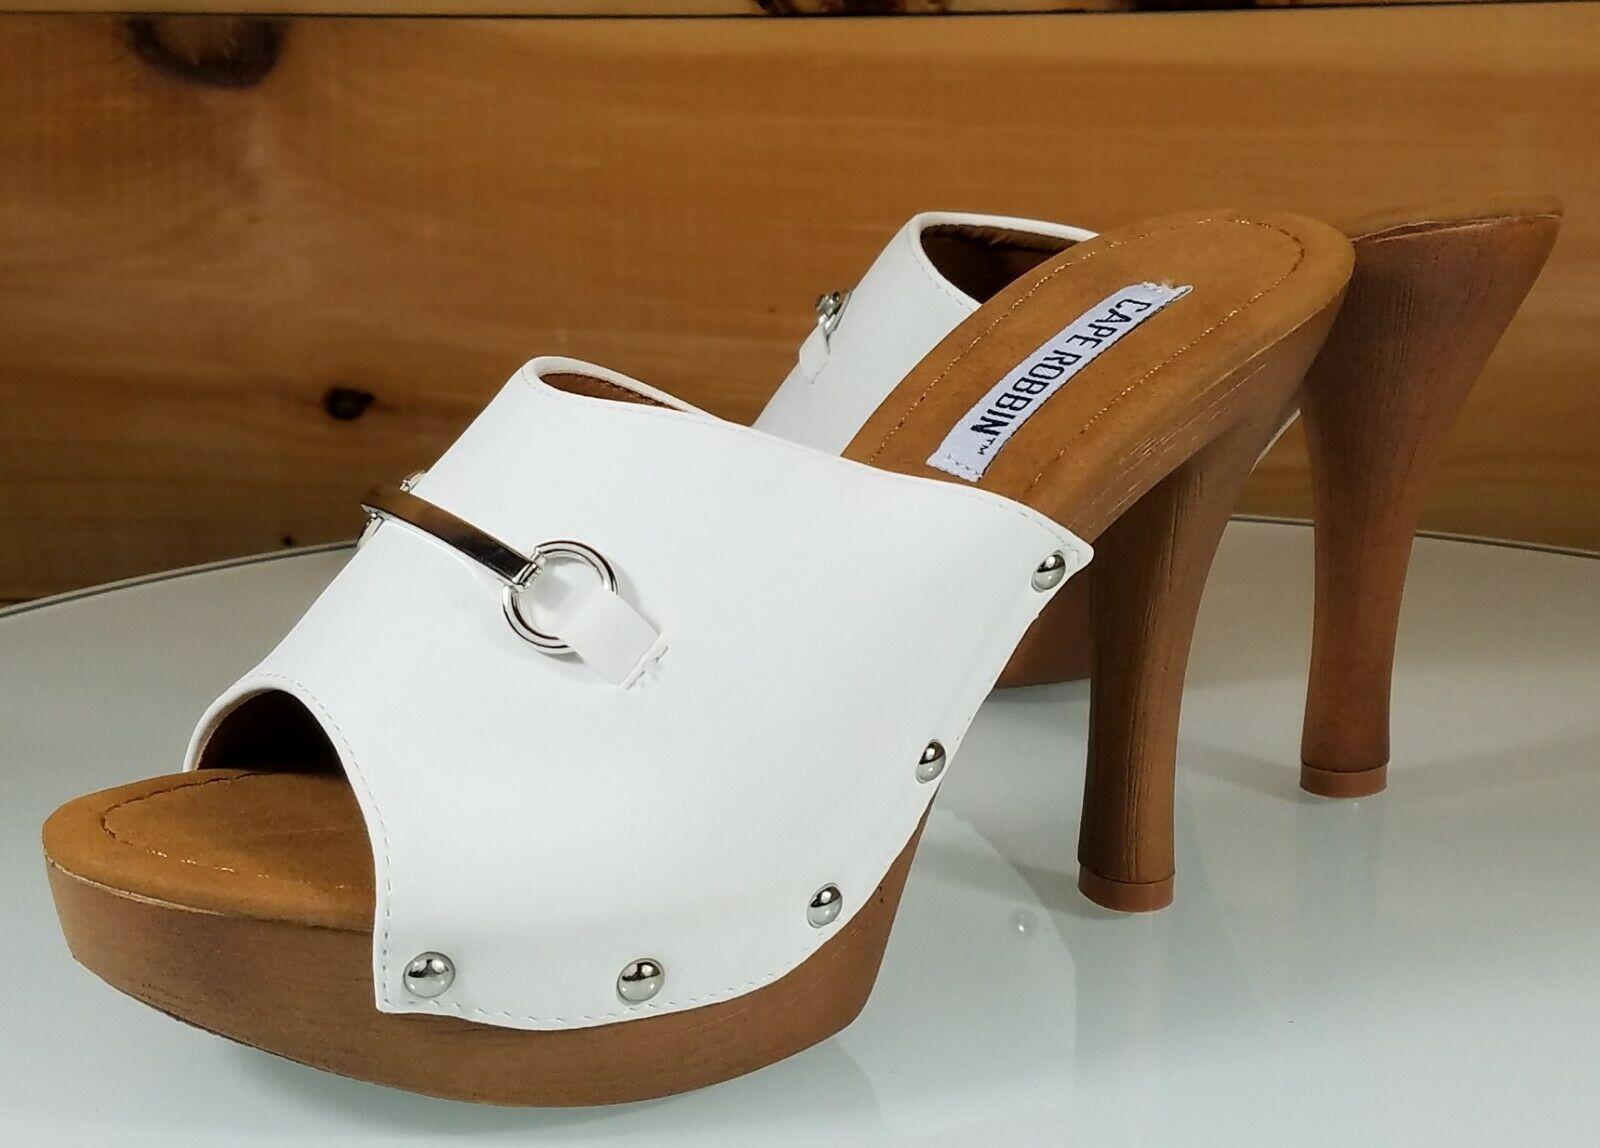 2e9efc1b2ed8 CR Slide White Silver Decor Faux Wood Slip On Mule Clog 4.5